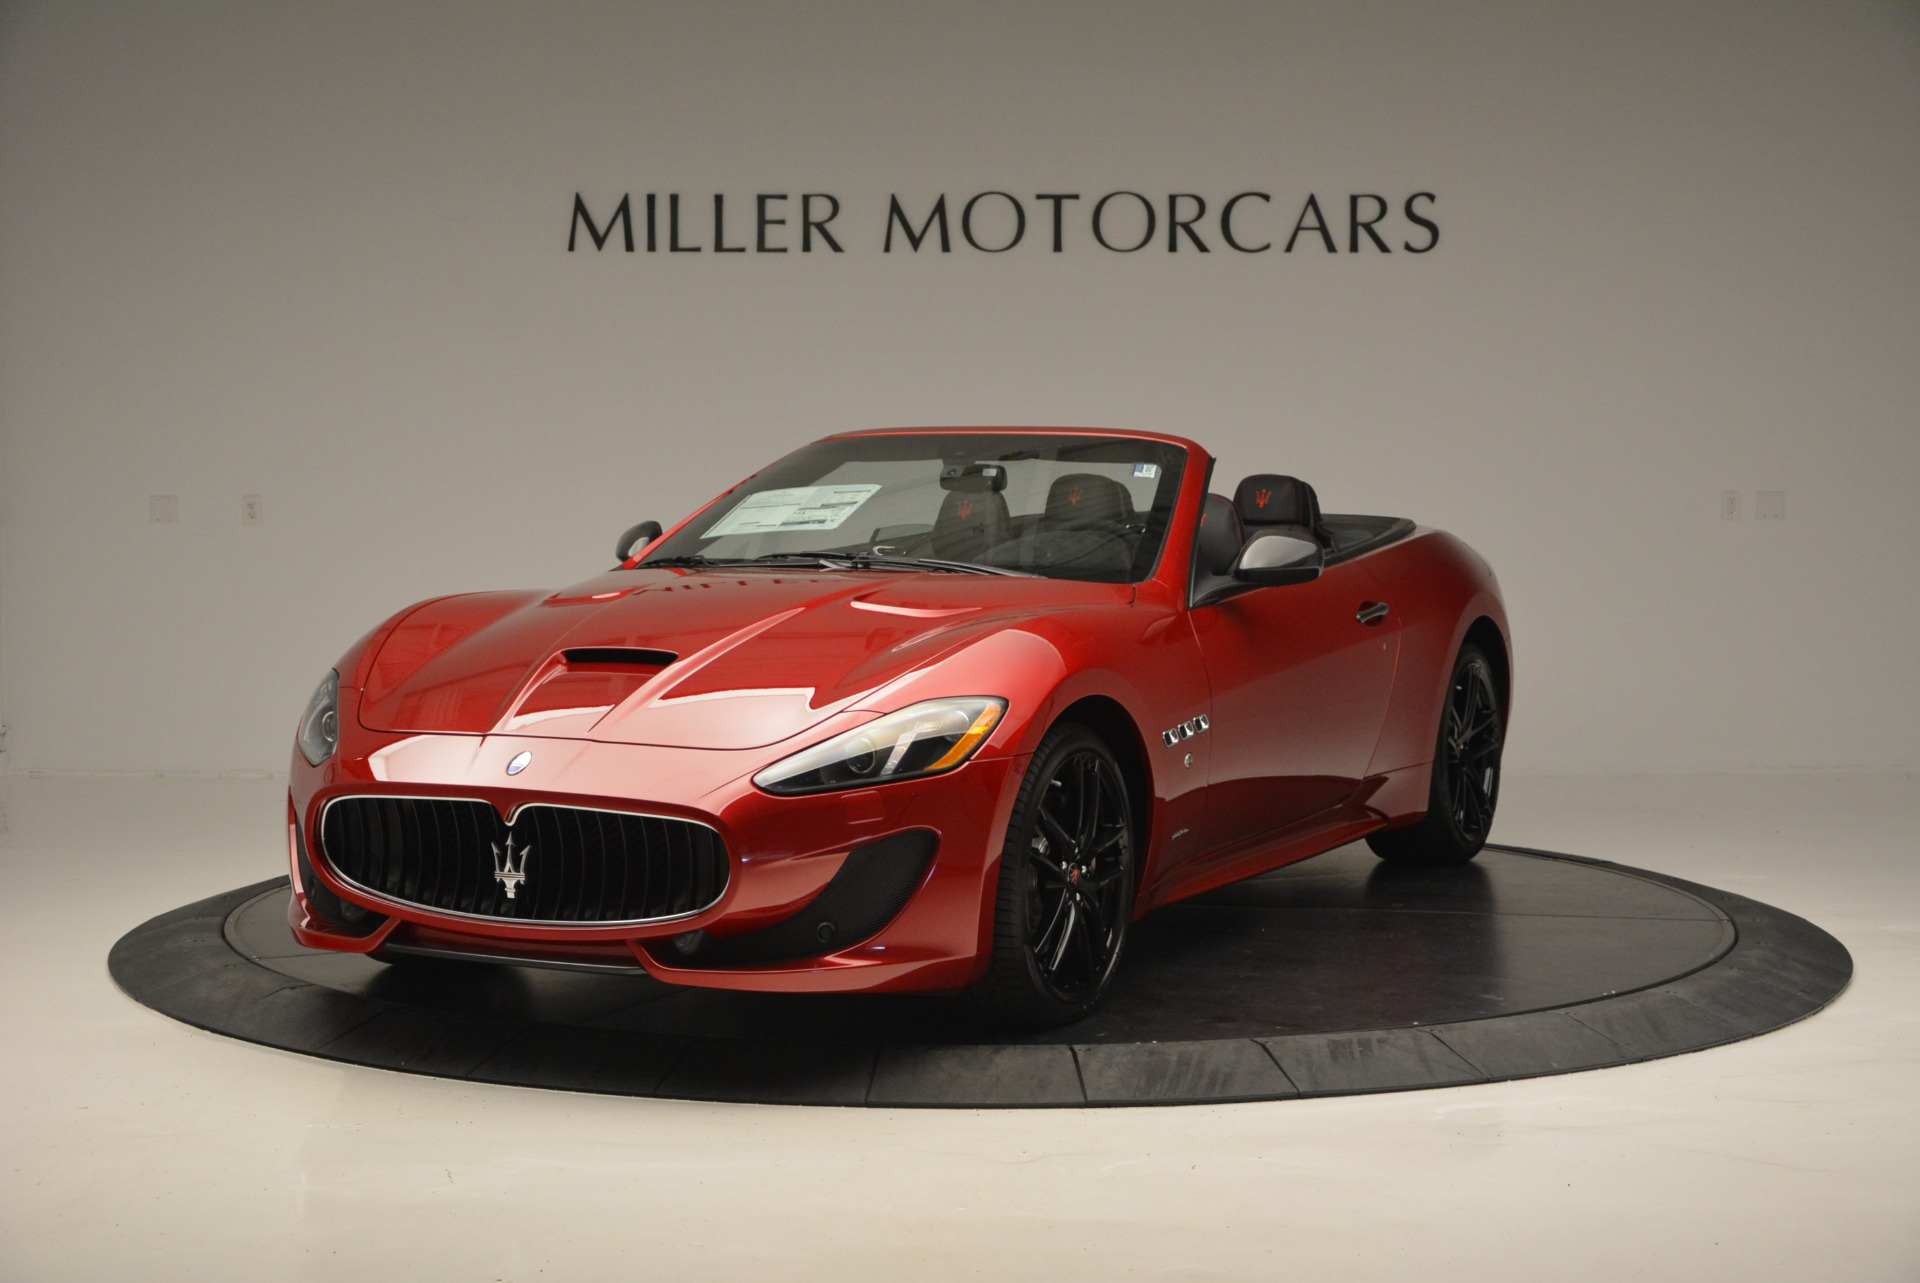 New 2017 Maserati GranTurismo Sport Special Edition For Sale In Westport, CT 763_main